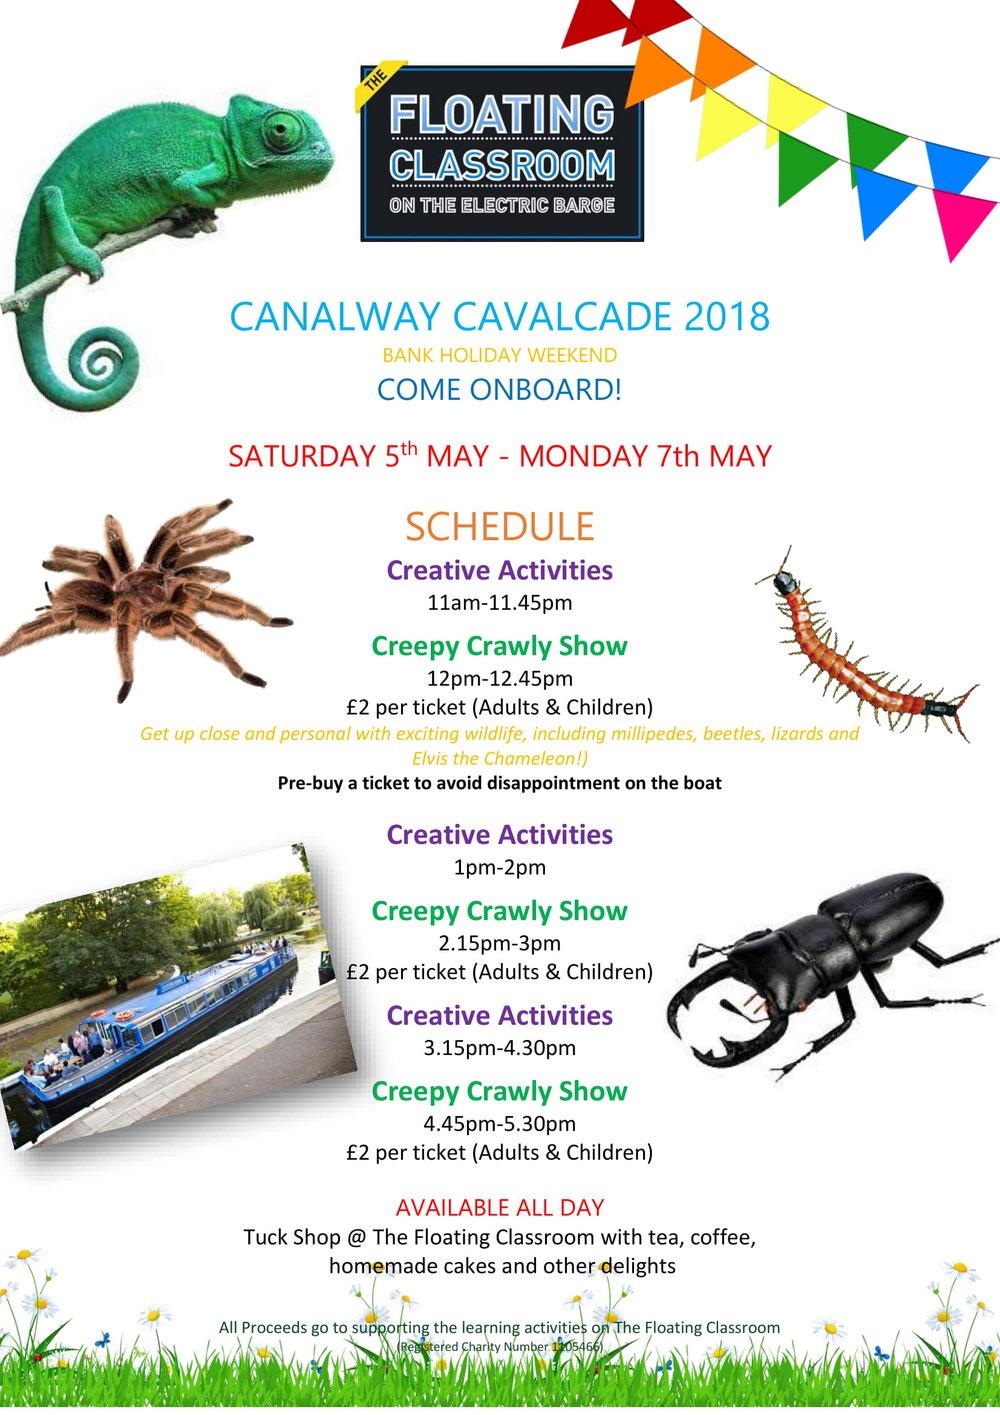 CAVALCADE 2018 FC Schedule-1.jpg